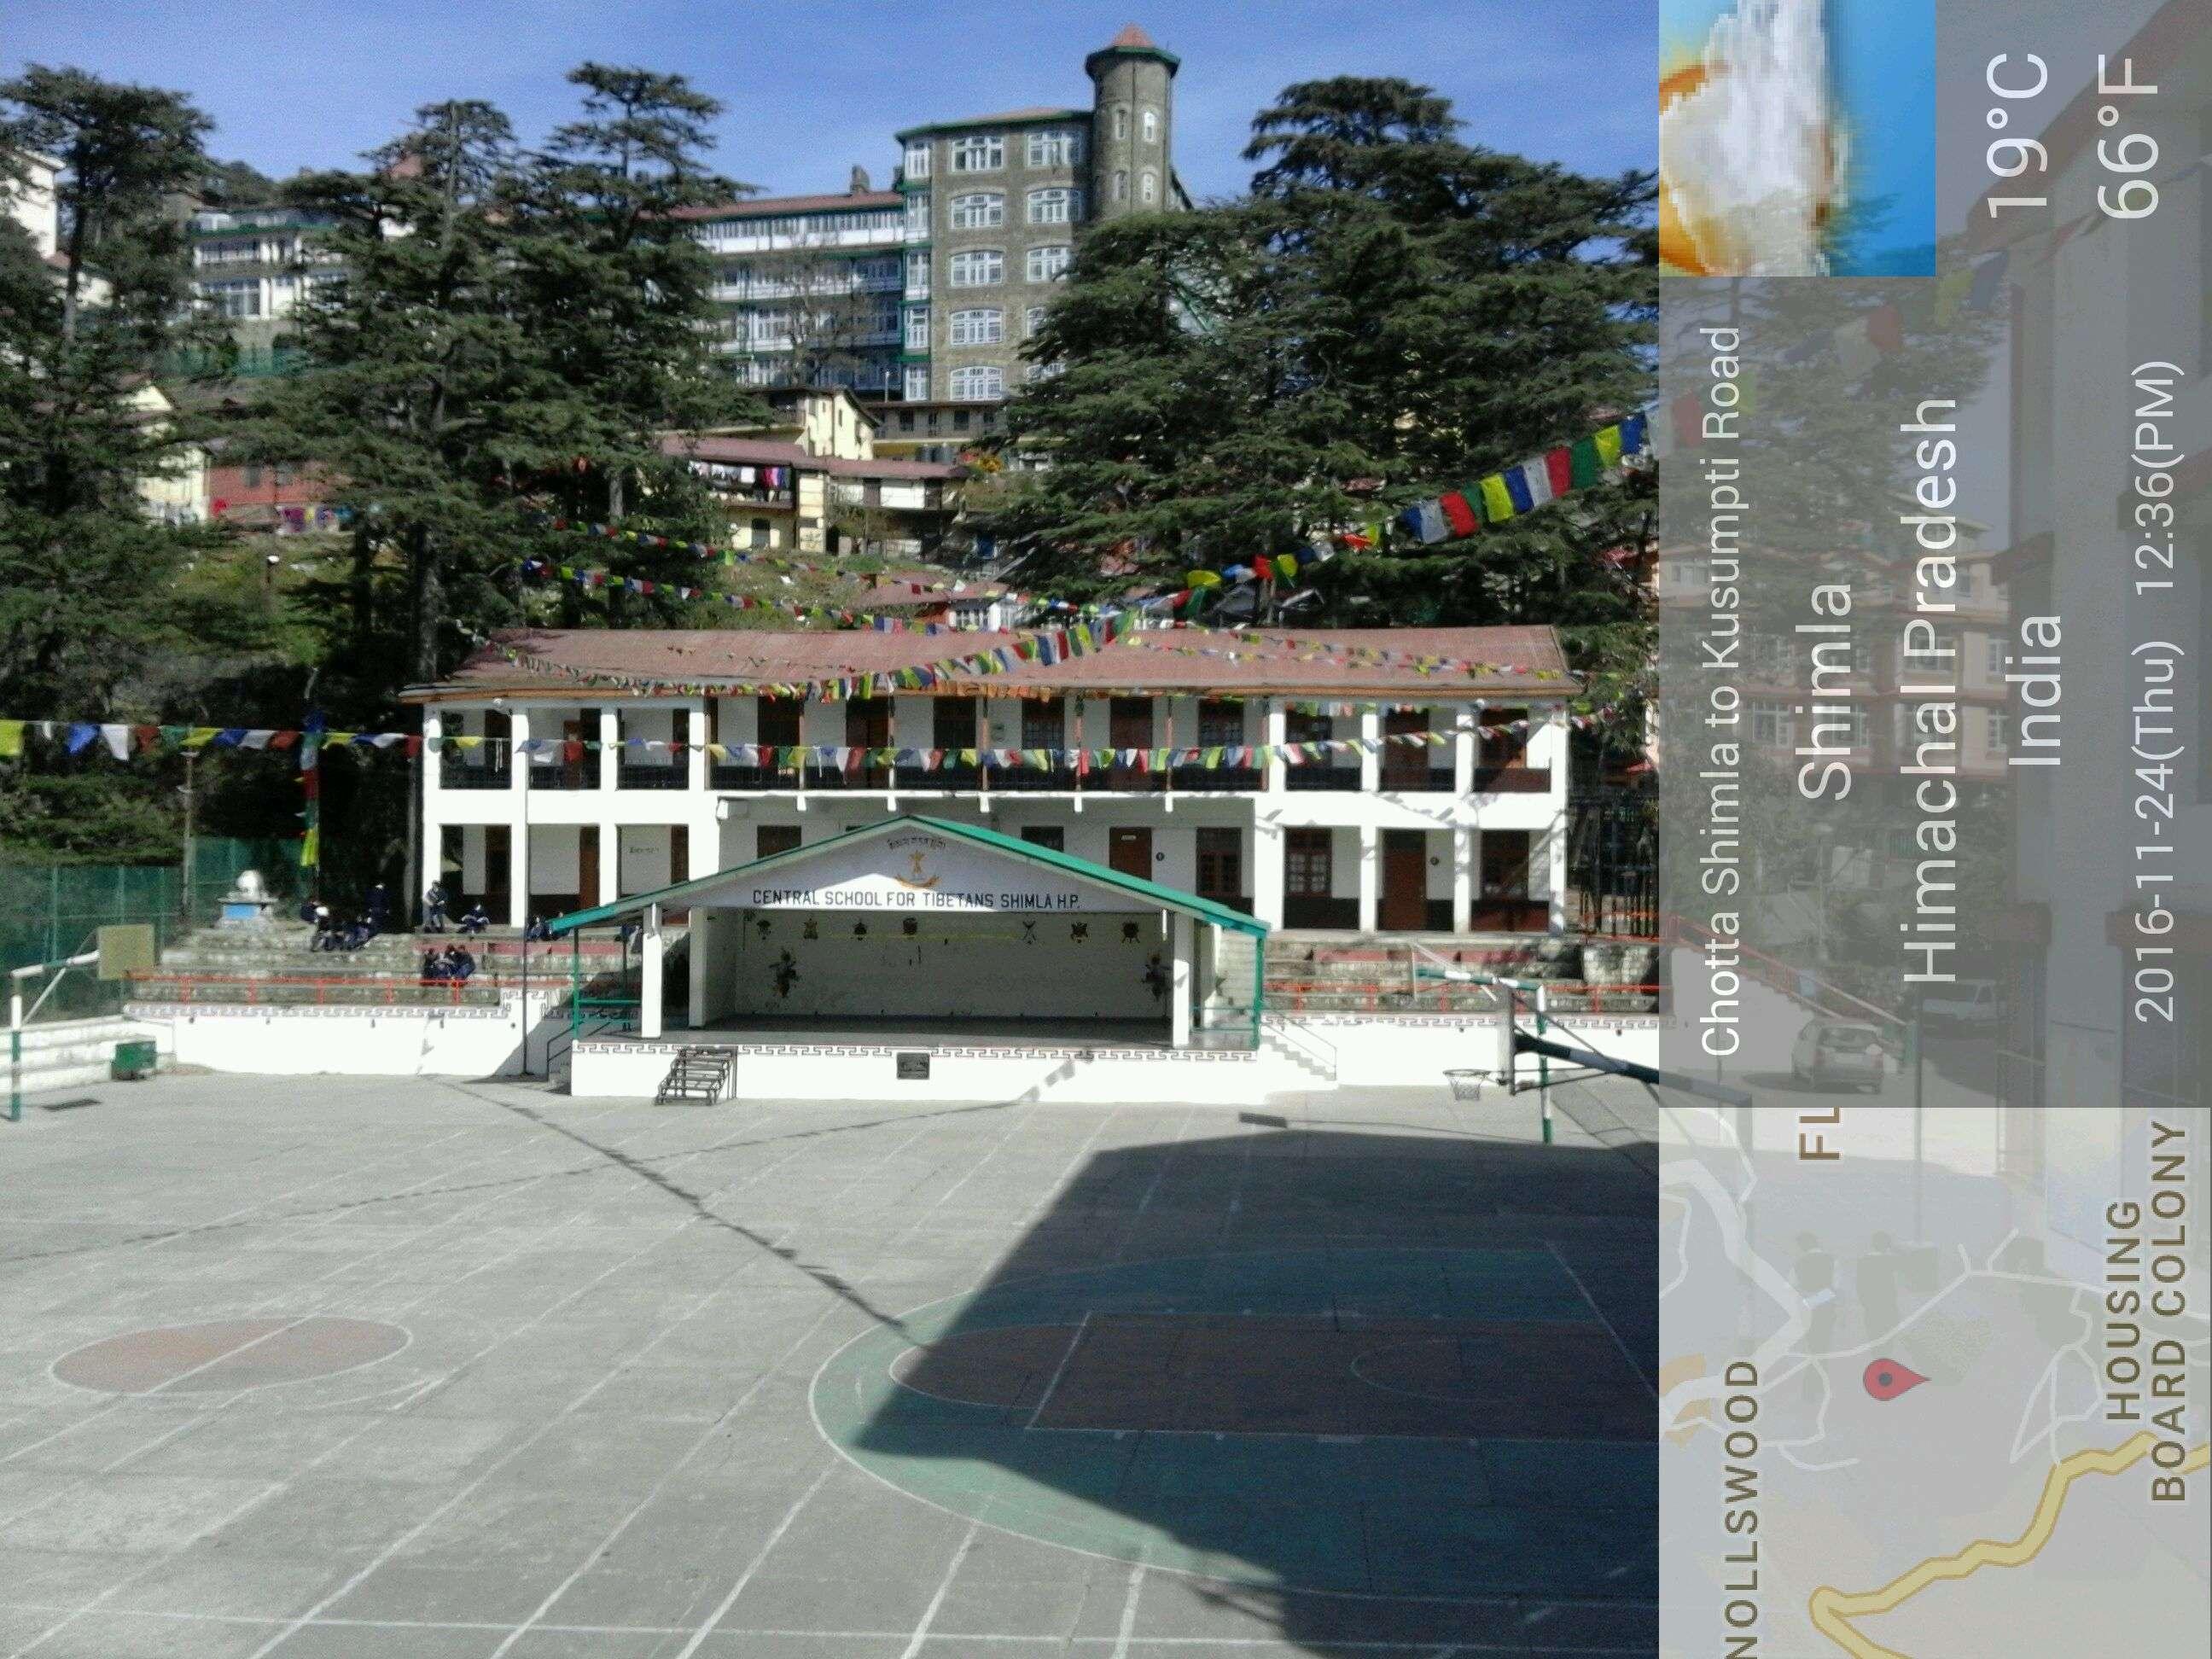 CENTRAL SCHOOL FOR TIBETANS SHIMLA HIMACHAL PRADESH 690001